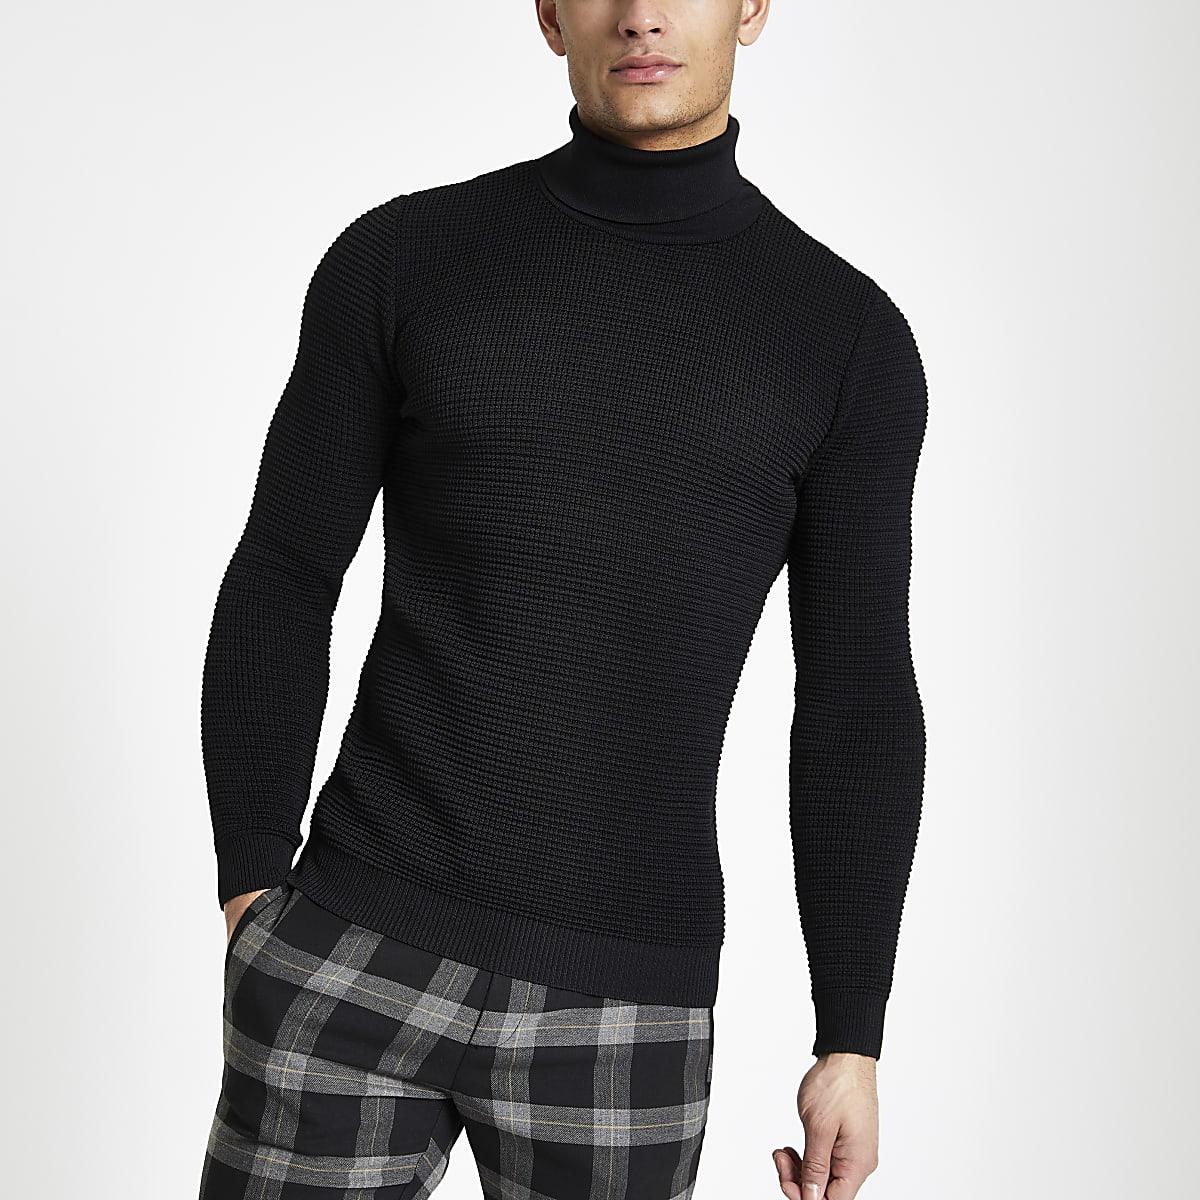 3fdf06bba31 Black textured slim fit roll neck jumper